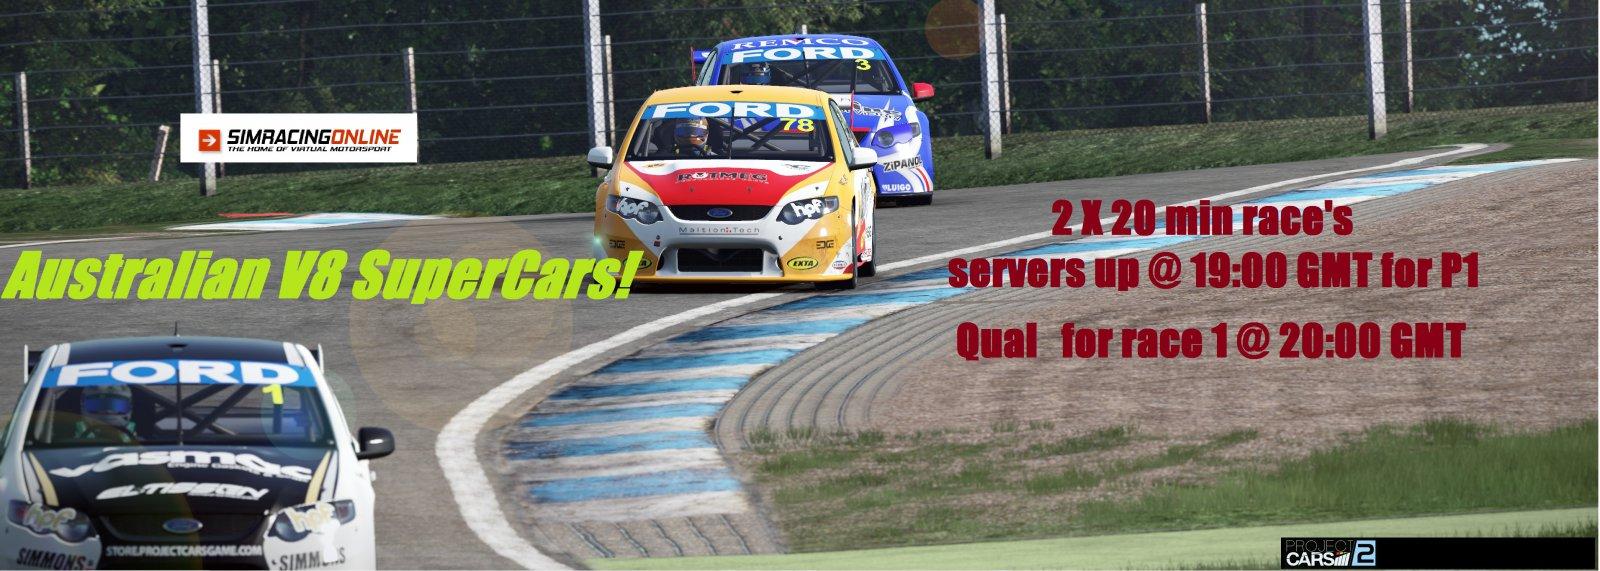 round 1 v8SC poster3.jpg